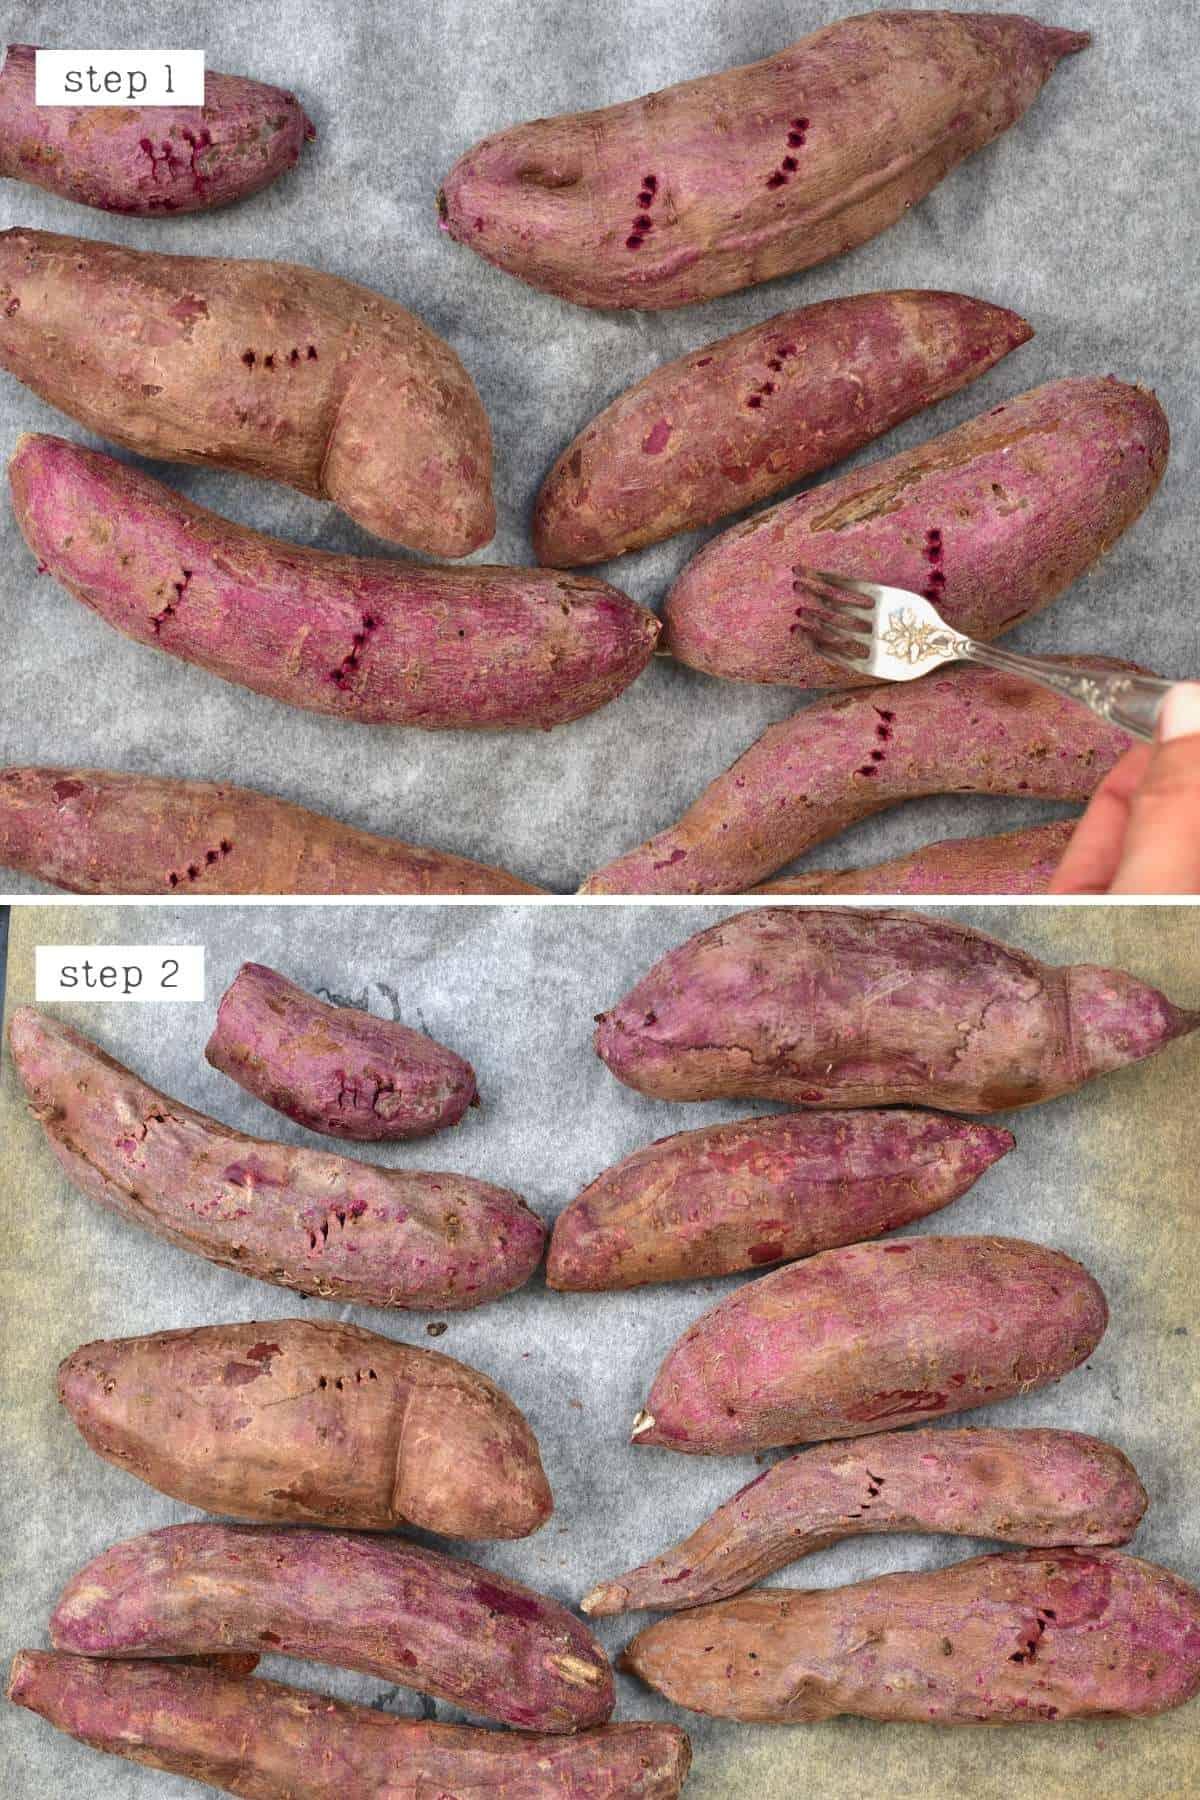 Baking purple sweet potatoes